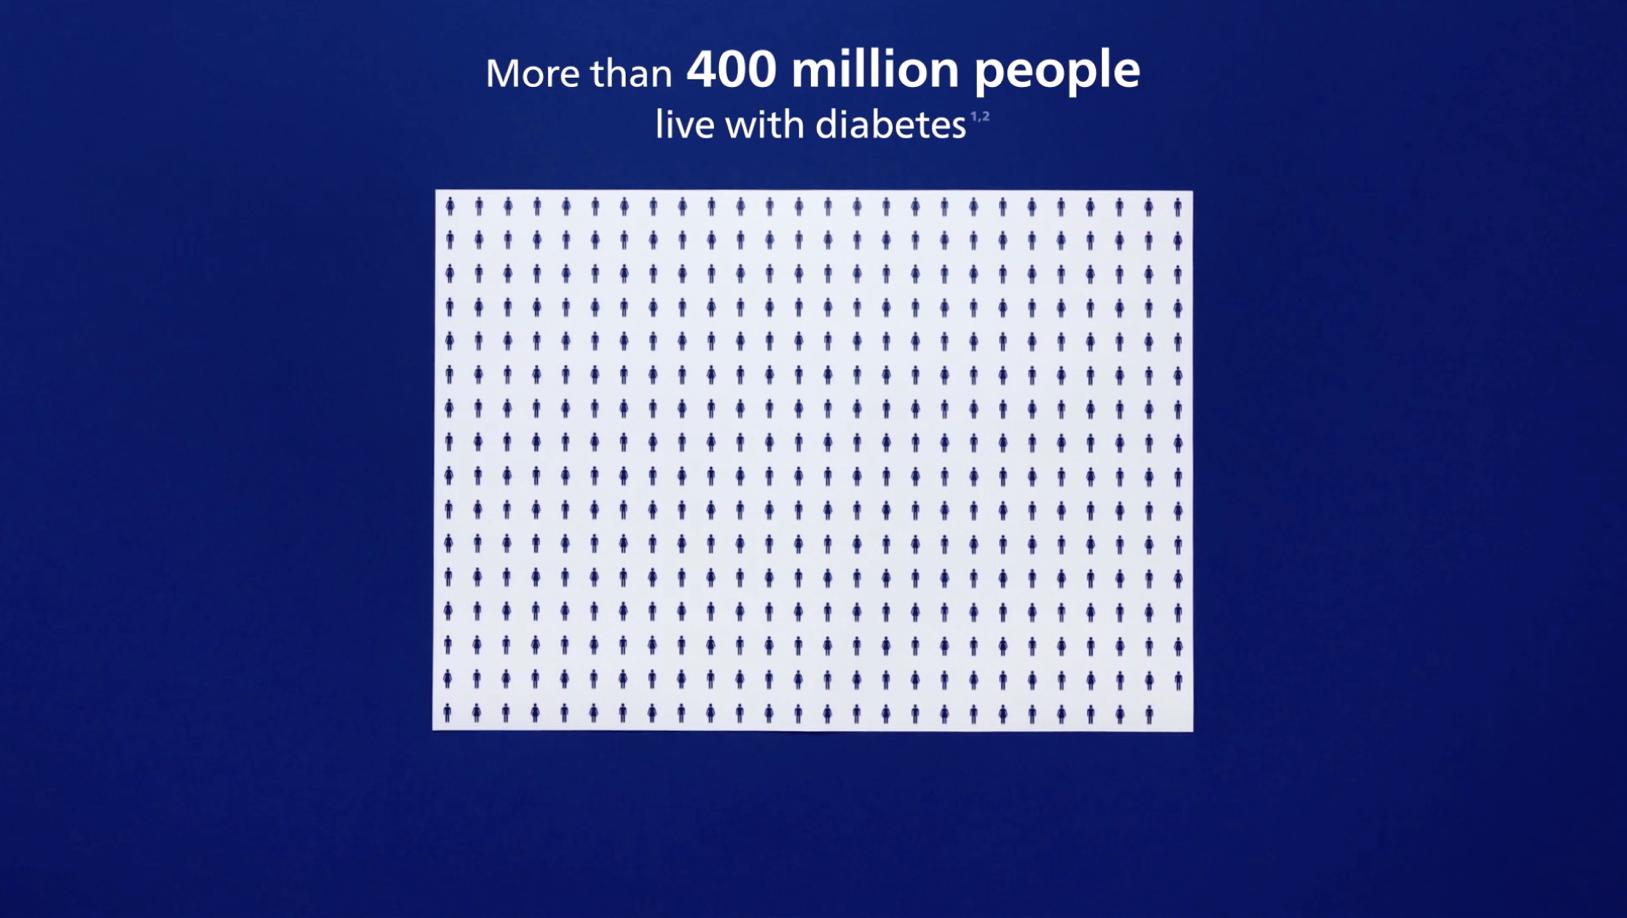 Diabetes worldwide by Ferdio data visualization